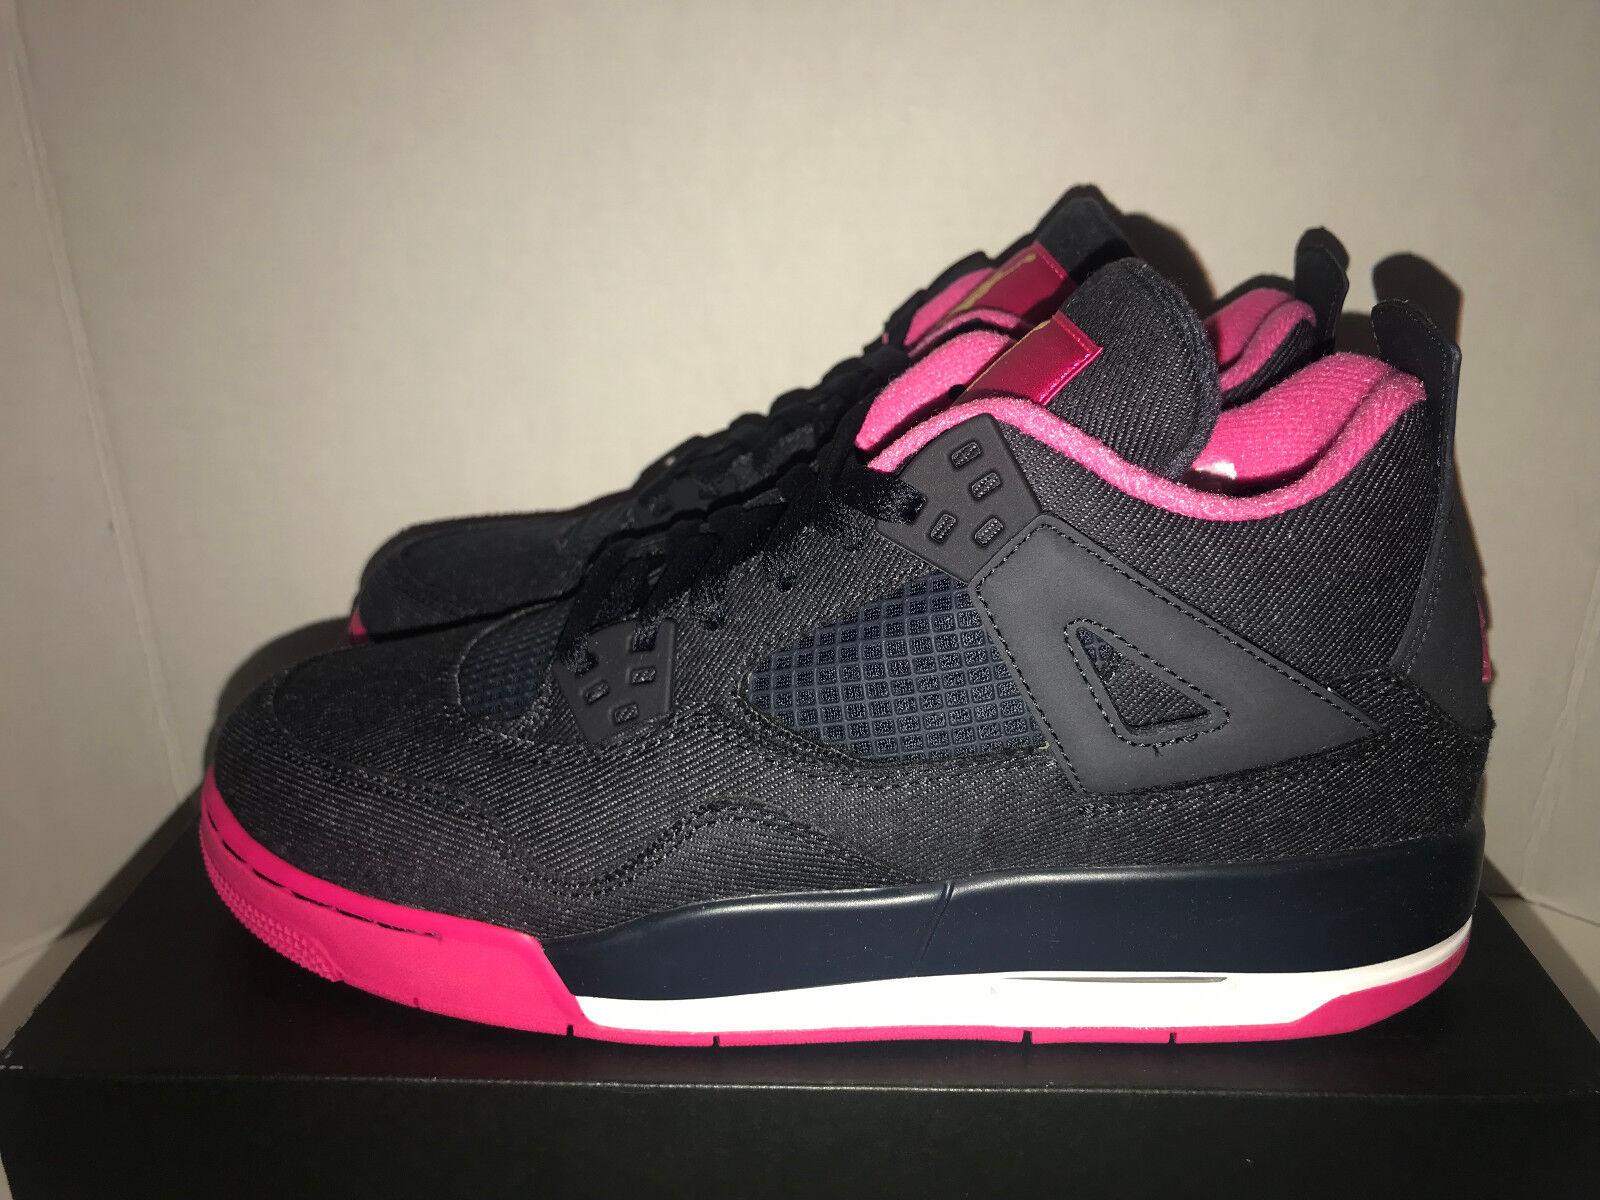 info for d932d 57277 Nike Jordan Retro 8 Denim Grade School Size 8 9 DS 487724 408